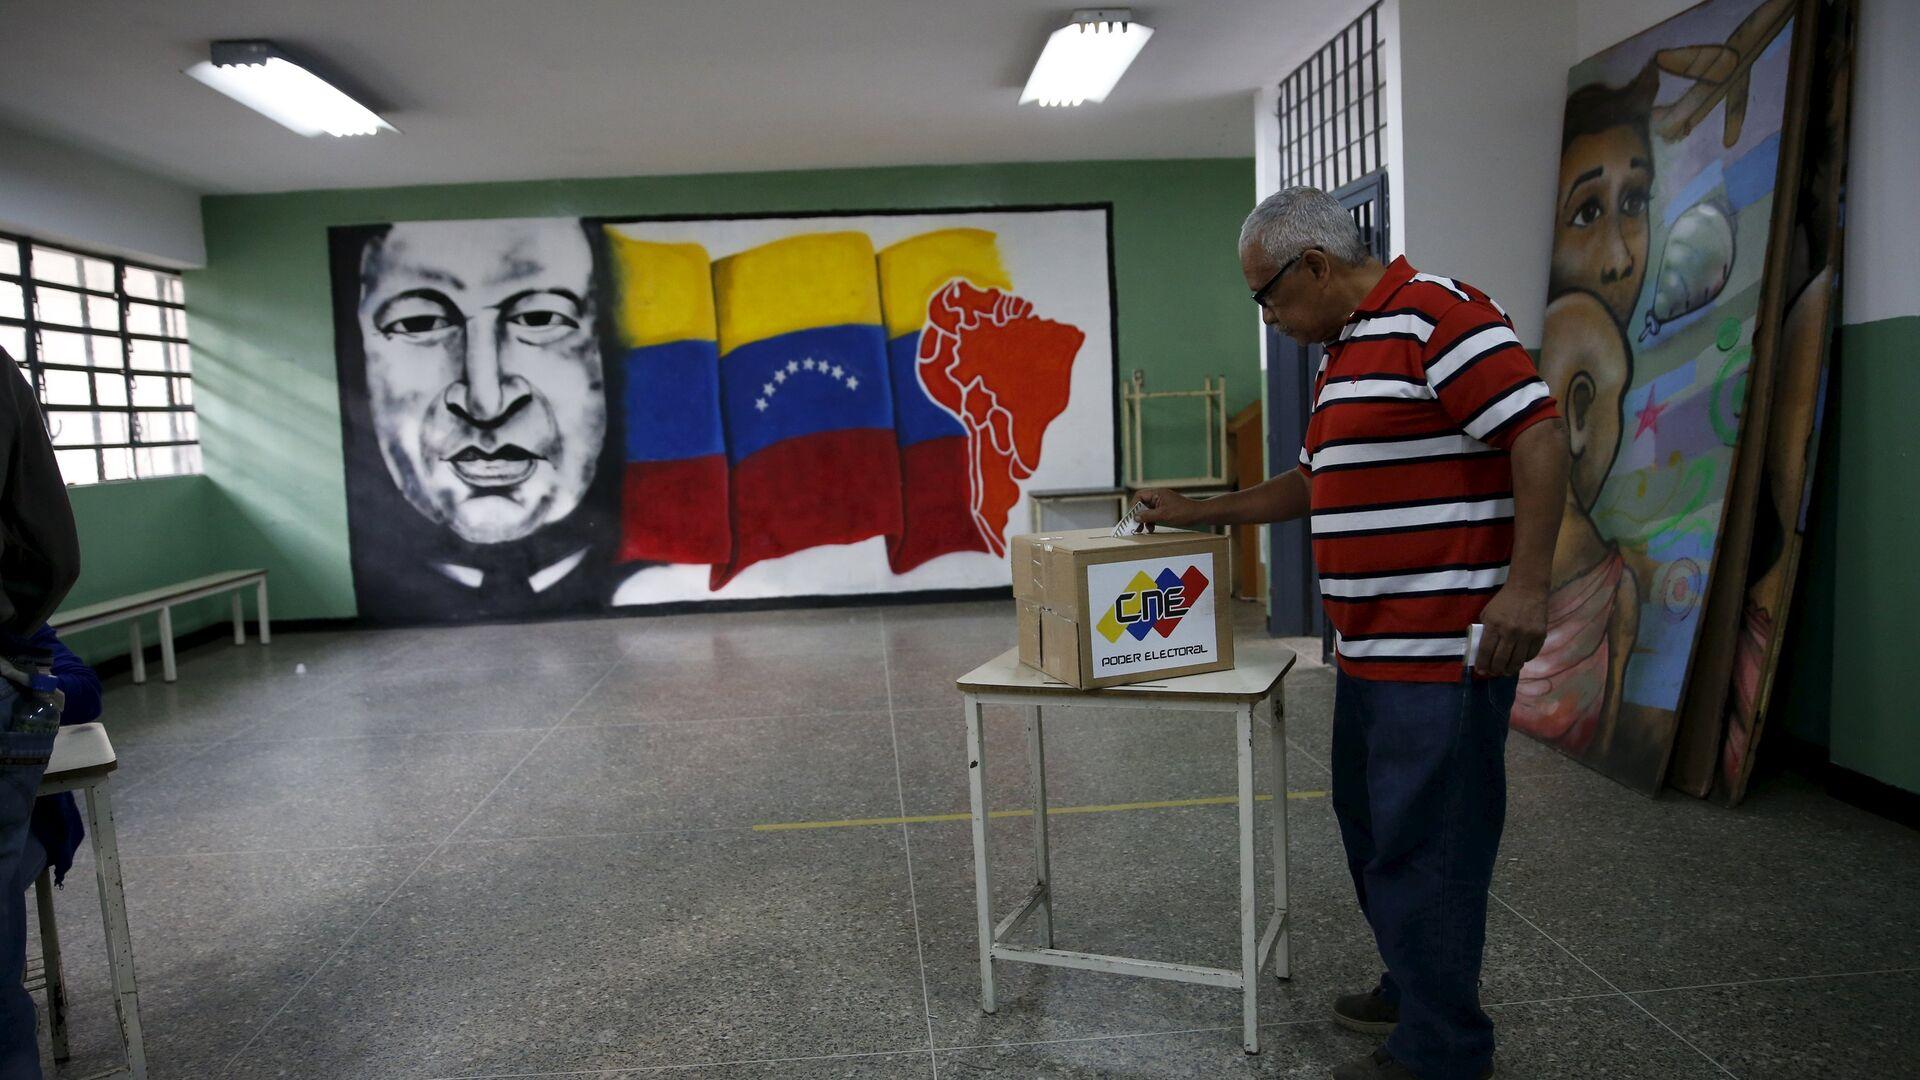 A man deposits his vote in a ballot box near a painting of Venezuela's late President Hugo Chavez during a legislative election, in Caracas - Sputnik Mundo, 1920, 18.03.2021